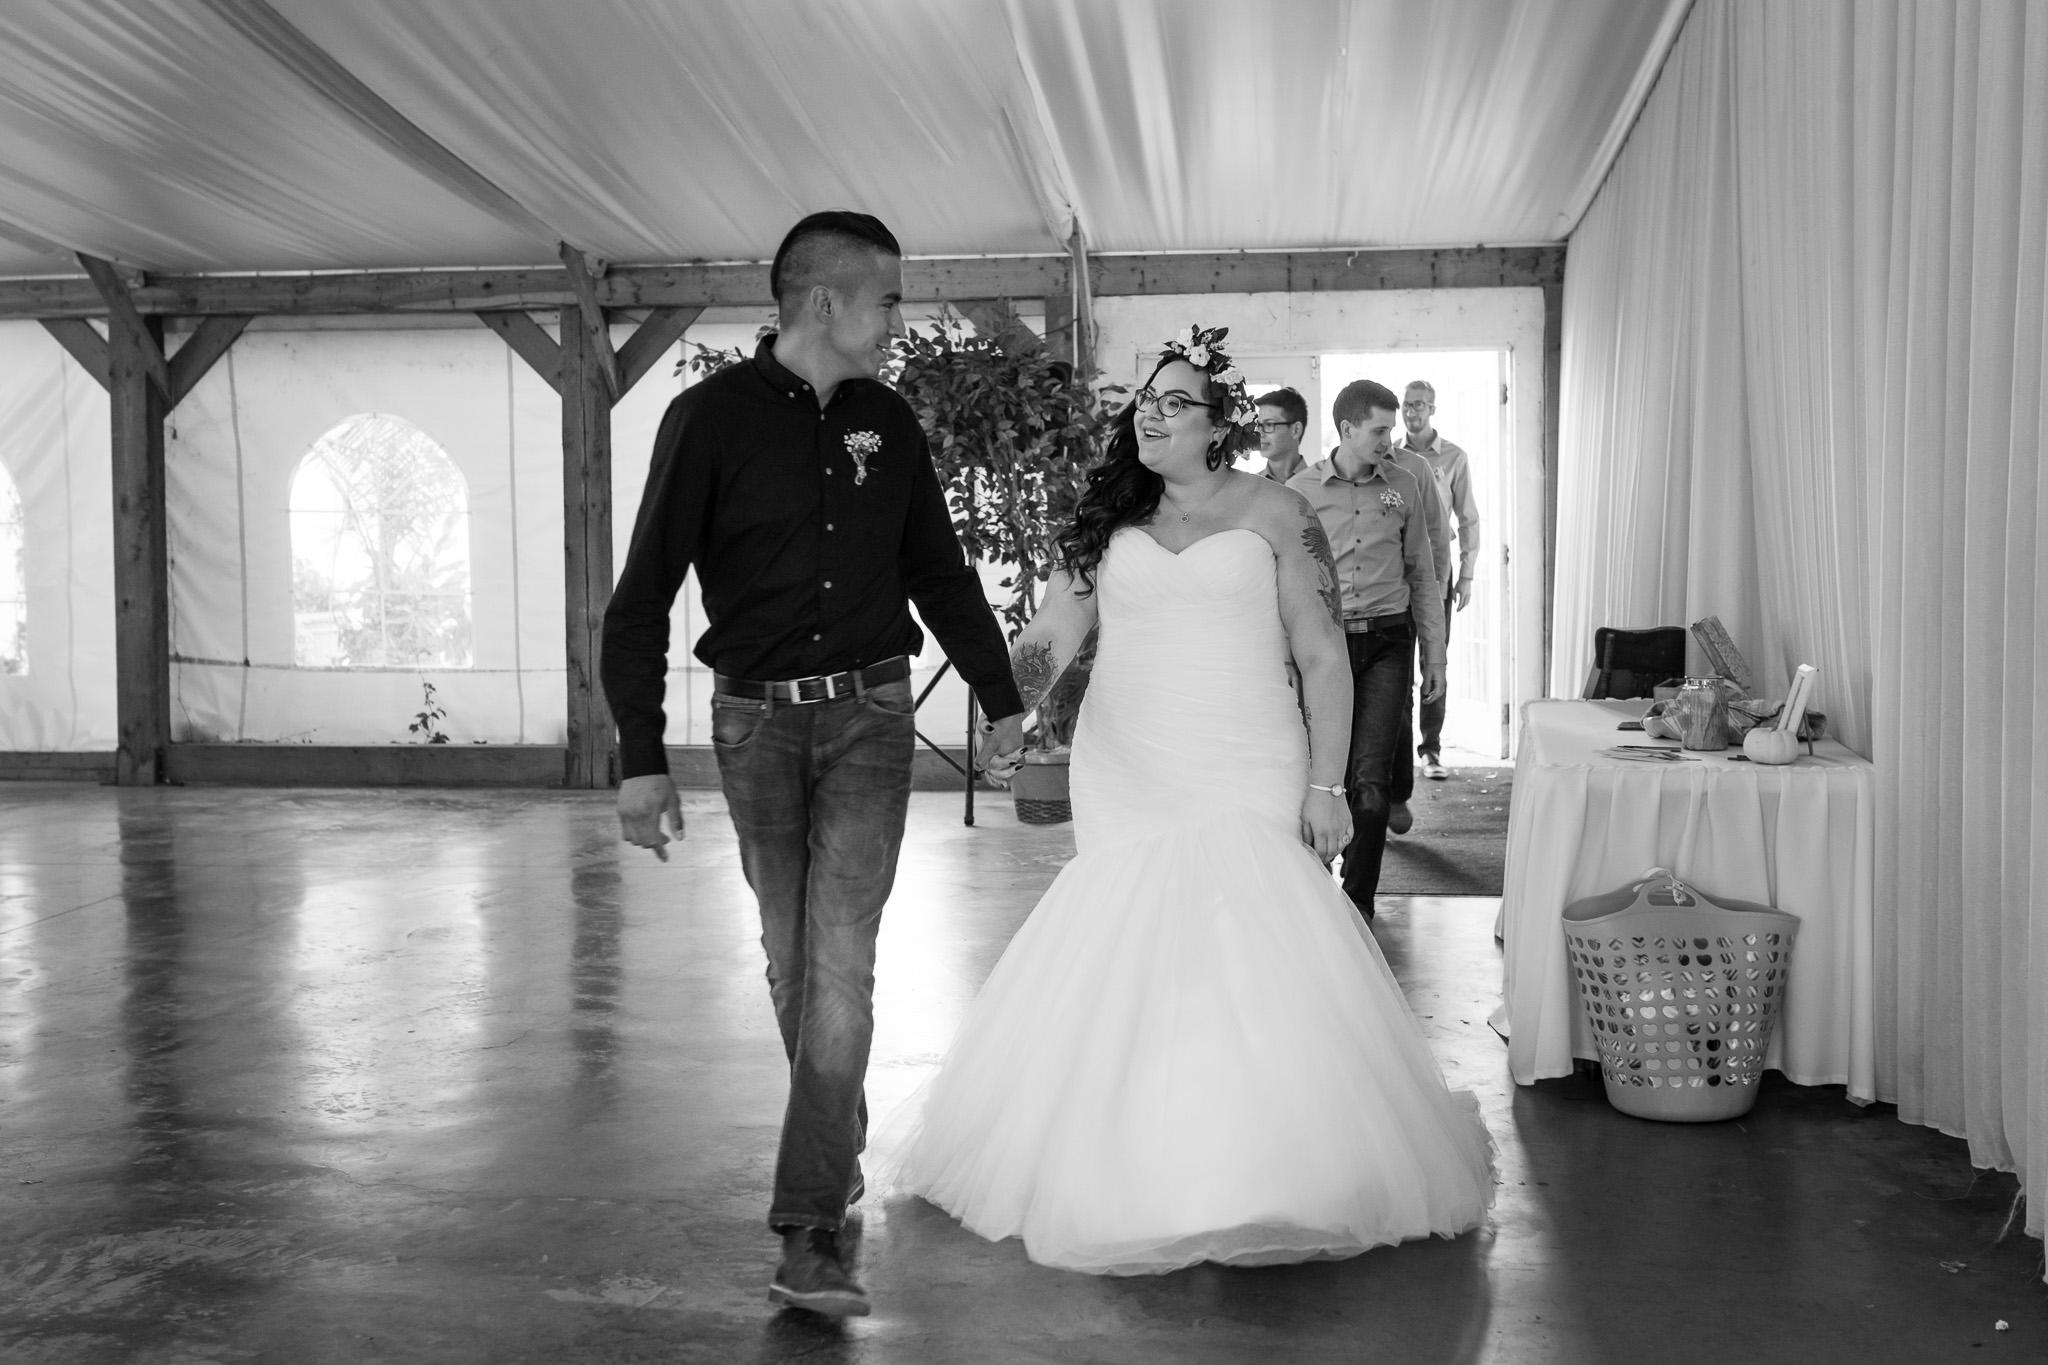 evergreen-village-winnipeg-wedding-48.jpg